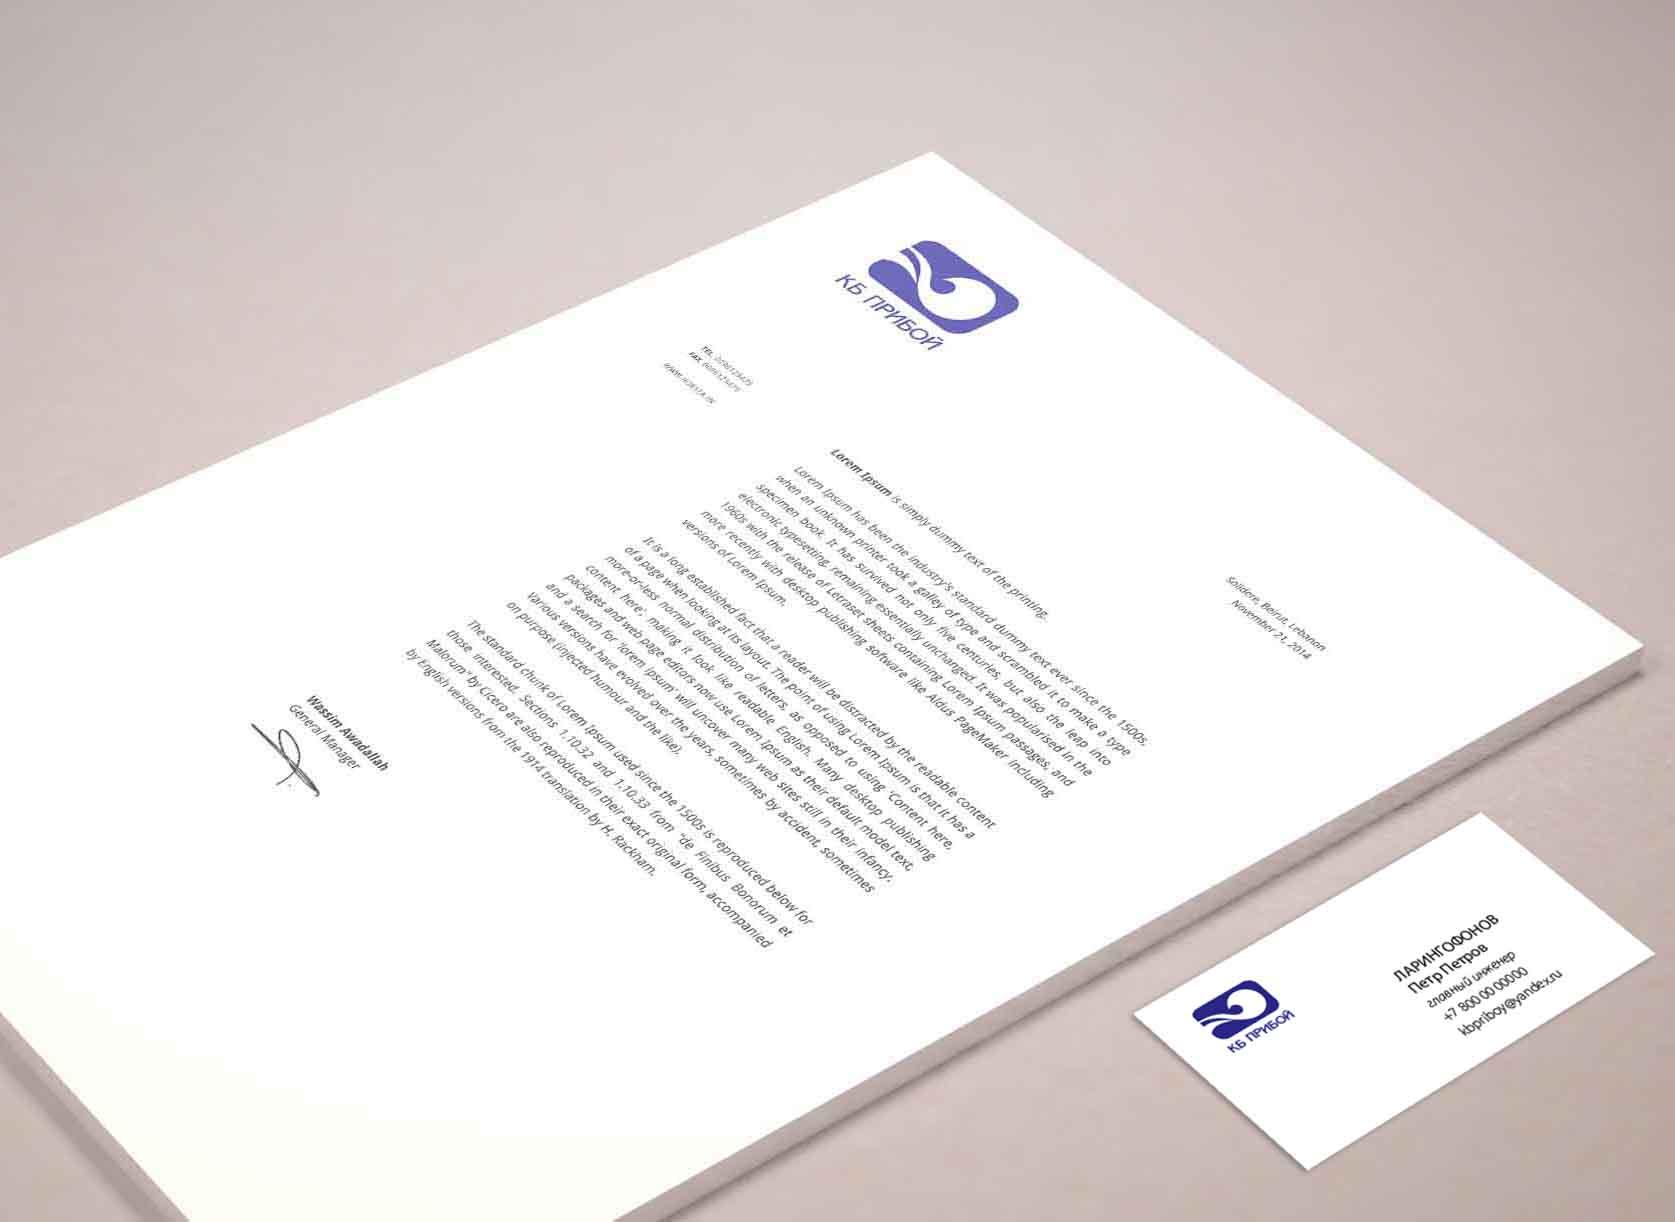 Разработка логотипа и фирменного стиля для КБ Прибой фото f_7645b277c384813b.jpg